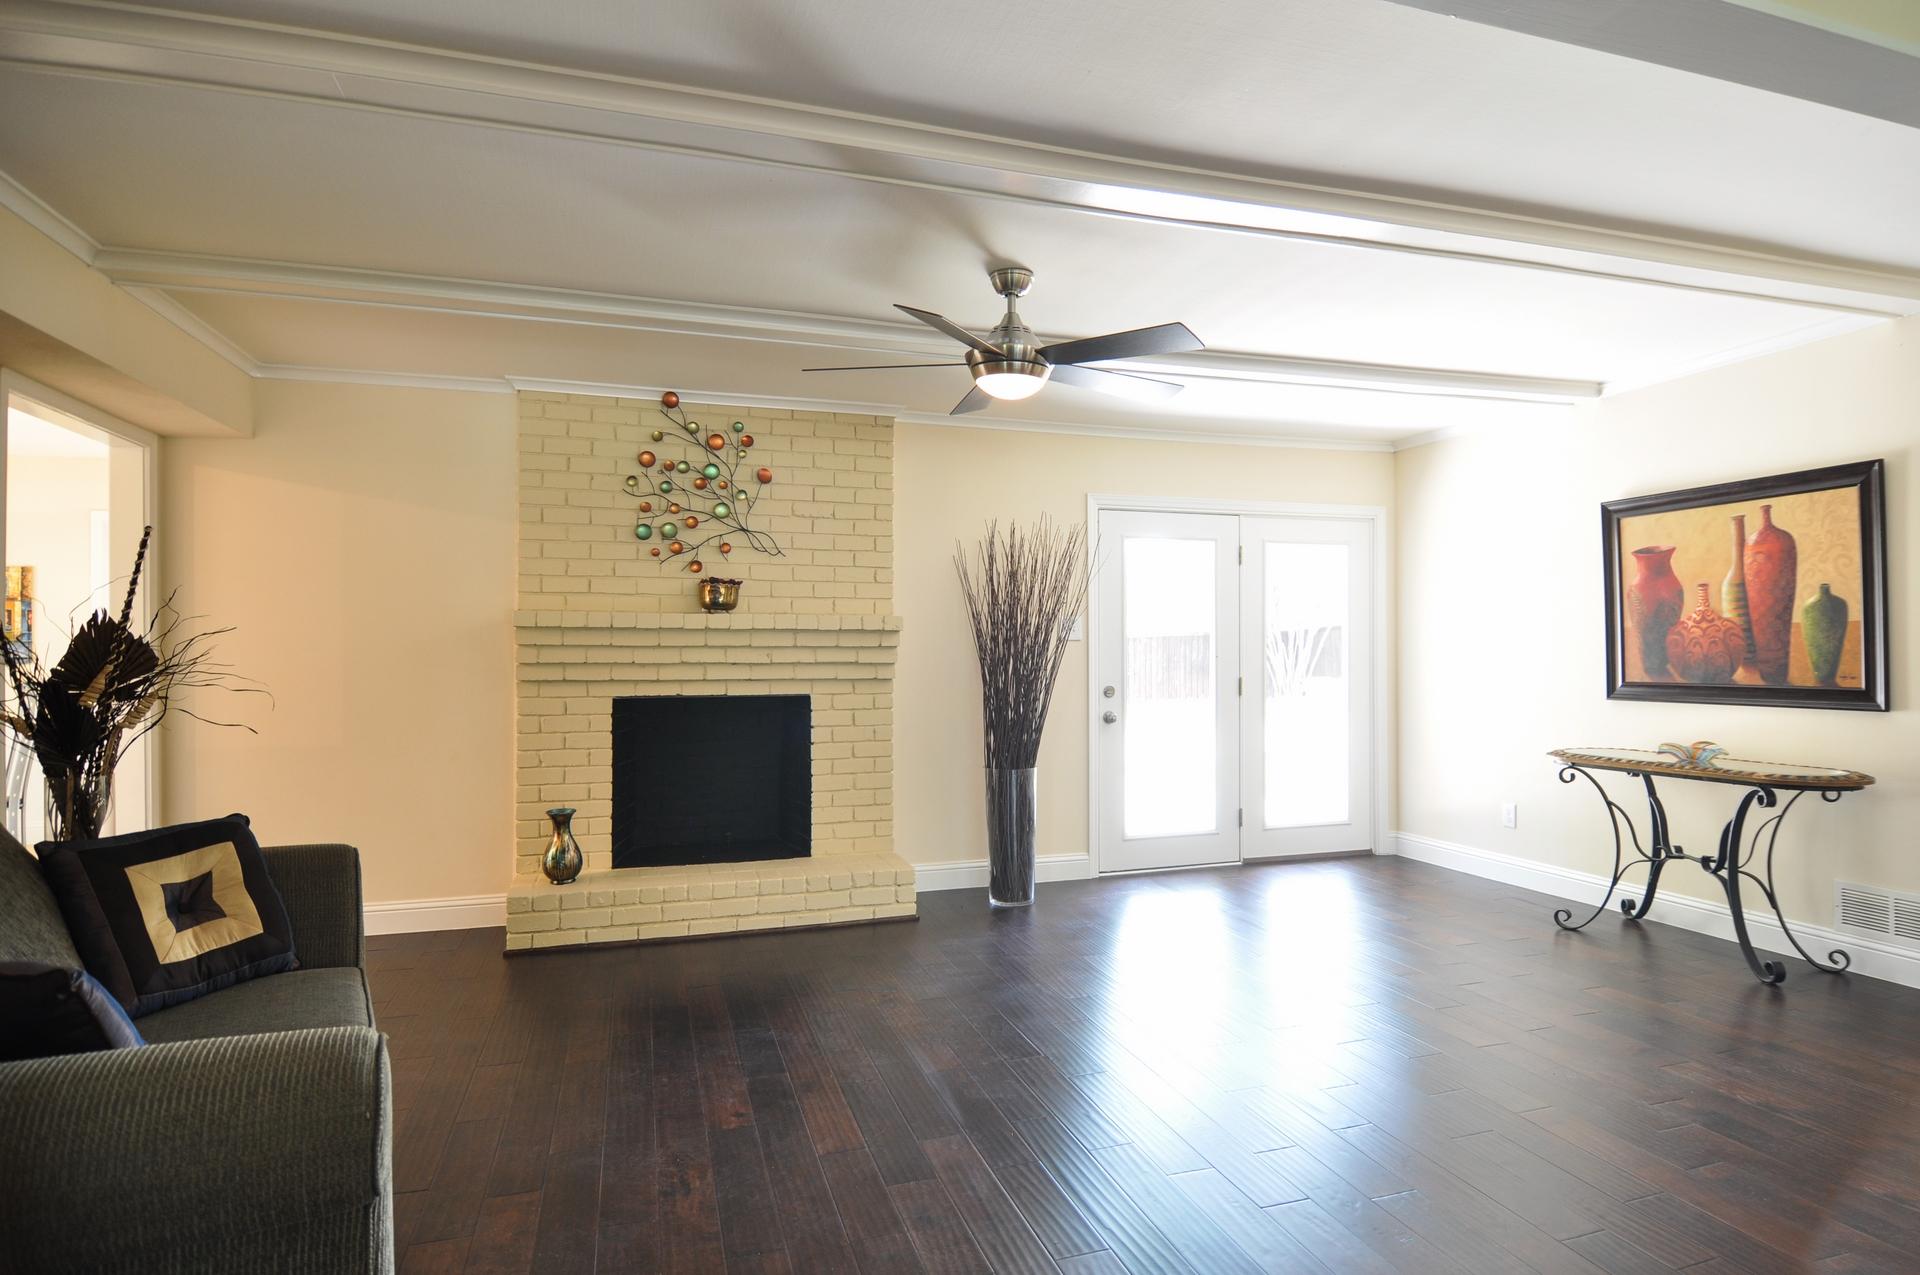 Family Room Fireplace 3133 Chapel Downs Dr Dallas TX 75229 Robert Jory.jpg